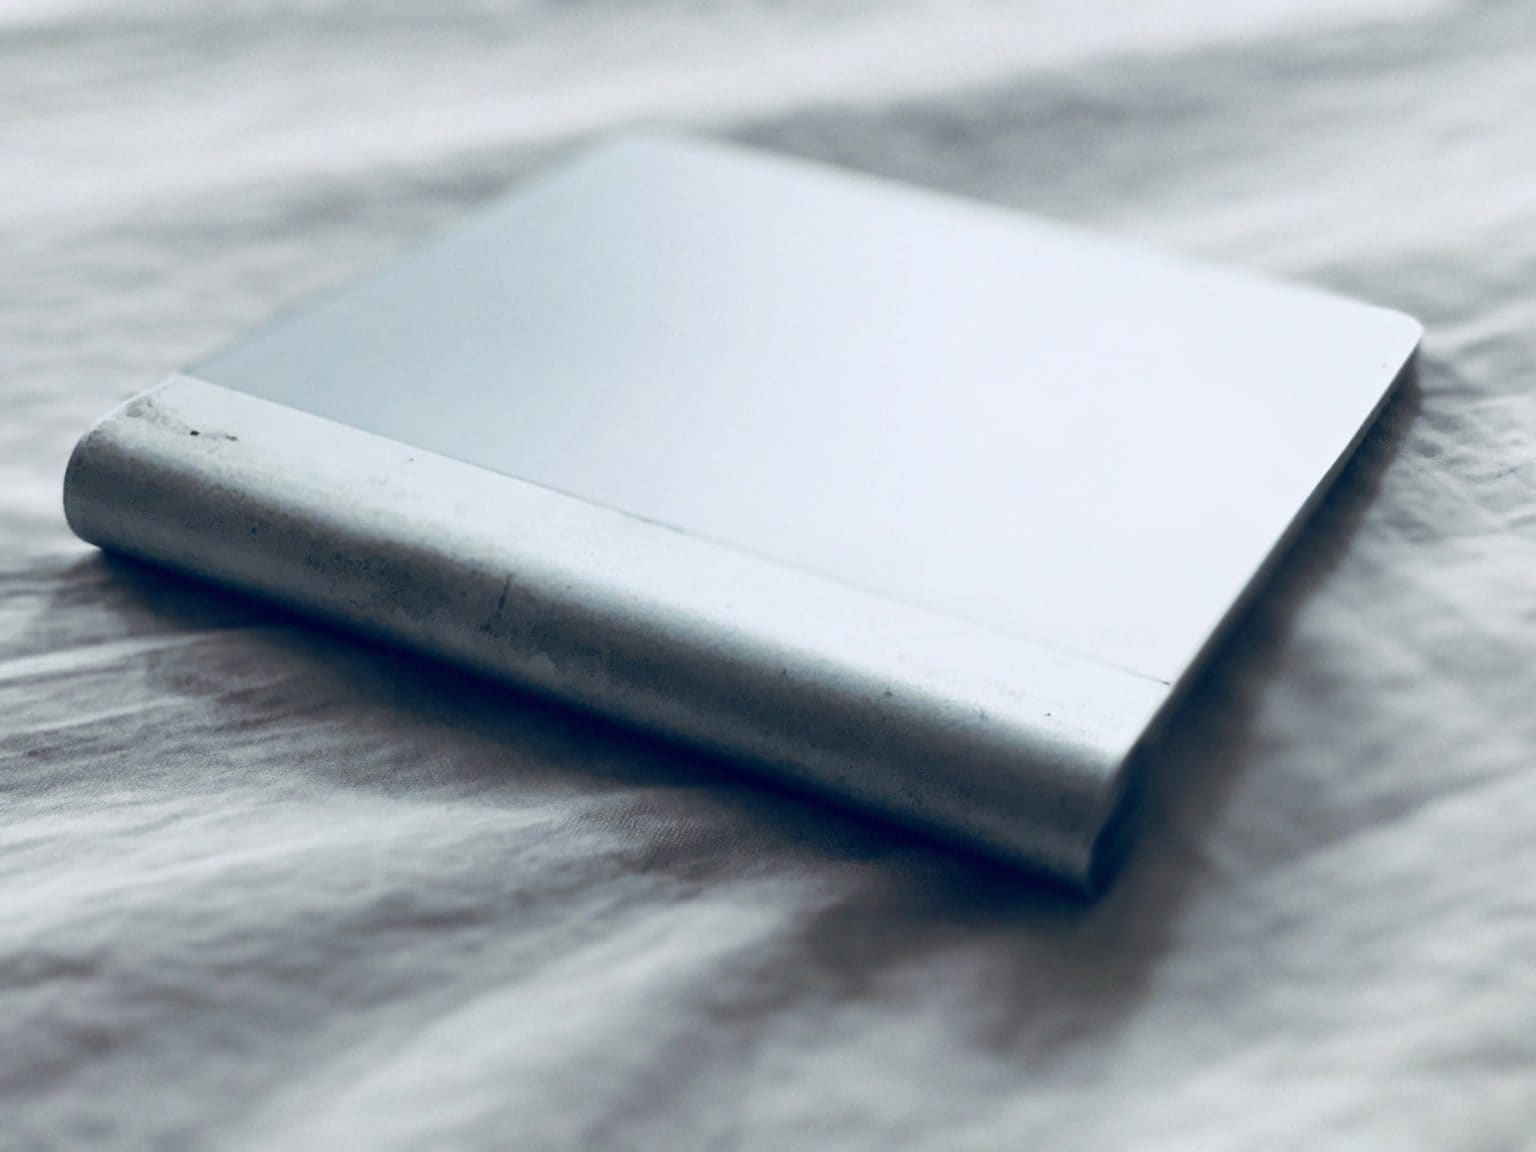 Trackpad upside-down